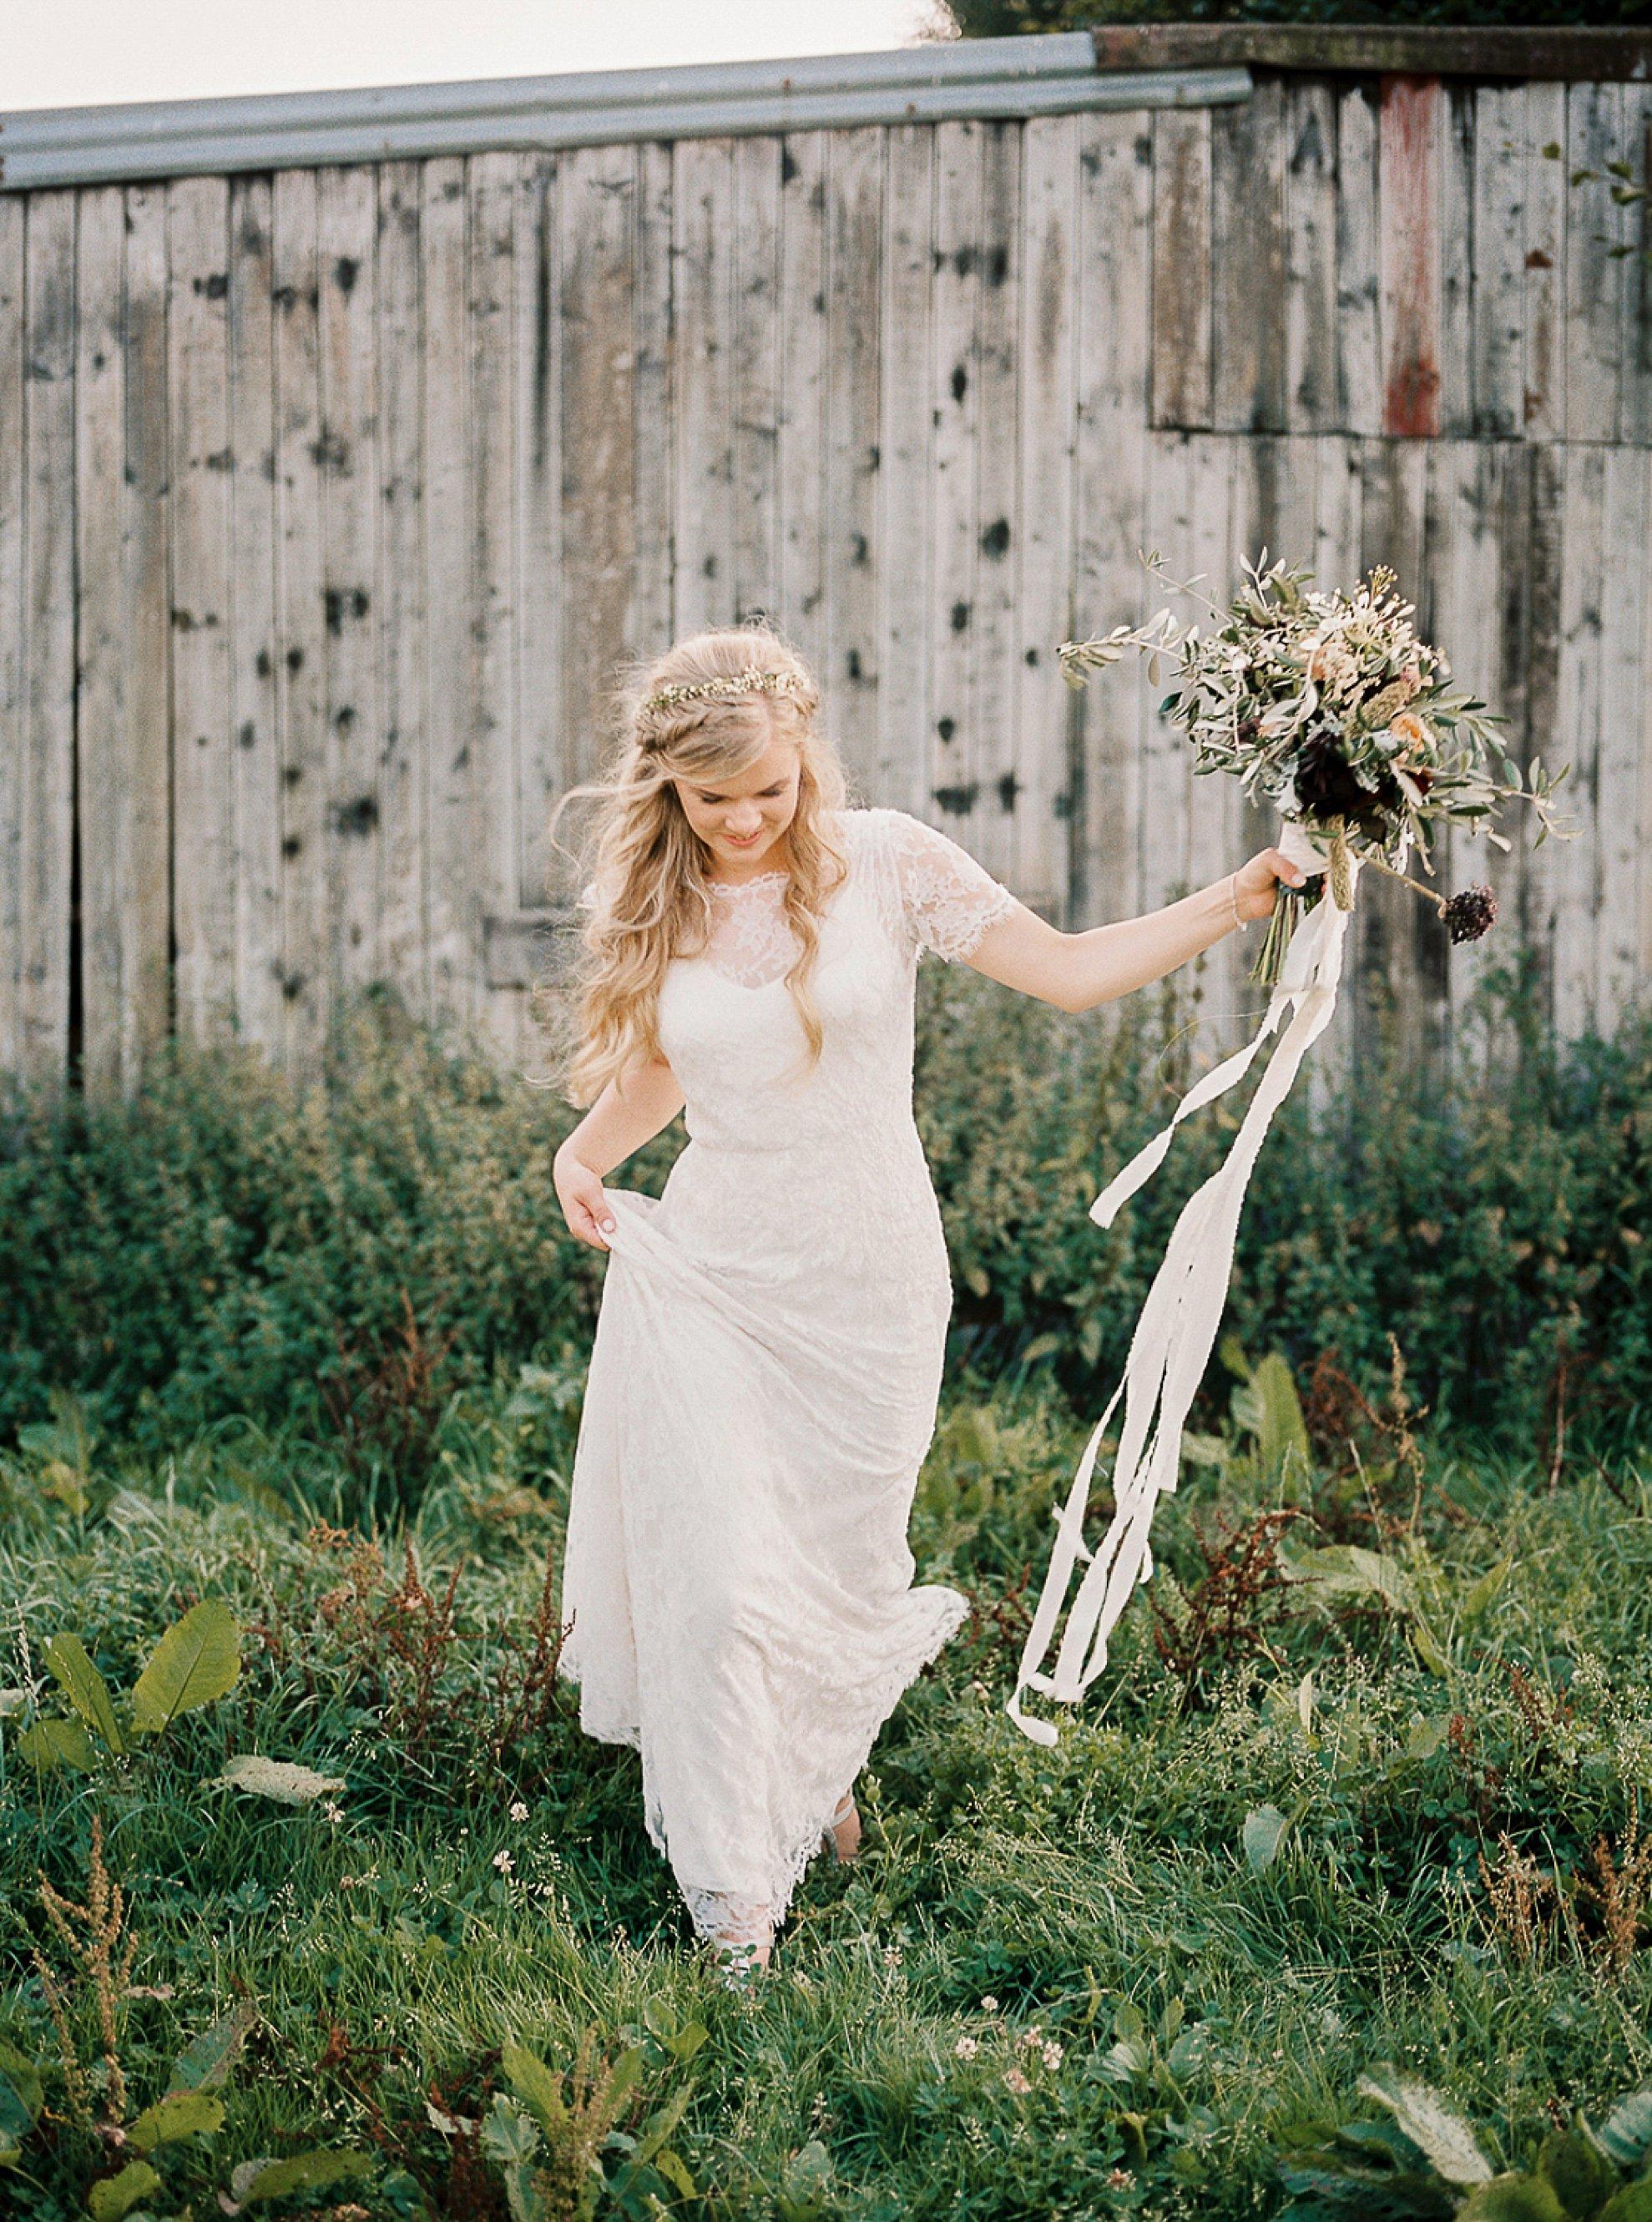 Amanda-Drost-Fotografie-Belgie-Photography-Wedding_0026.jpg